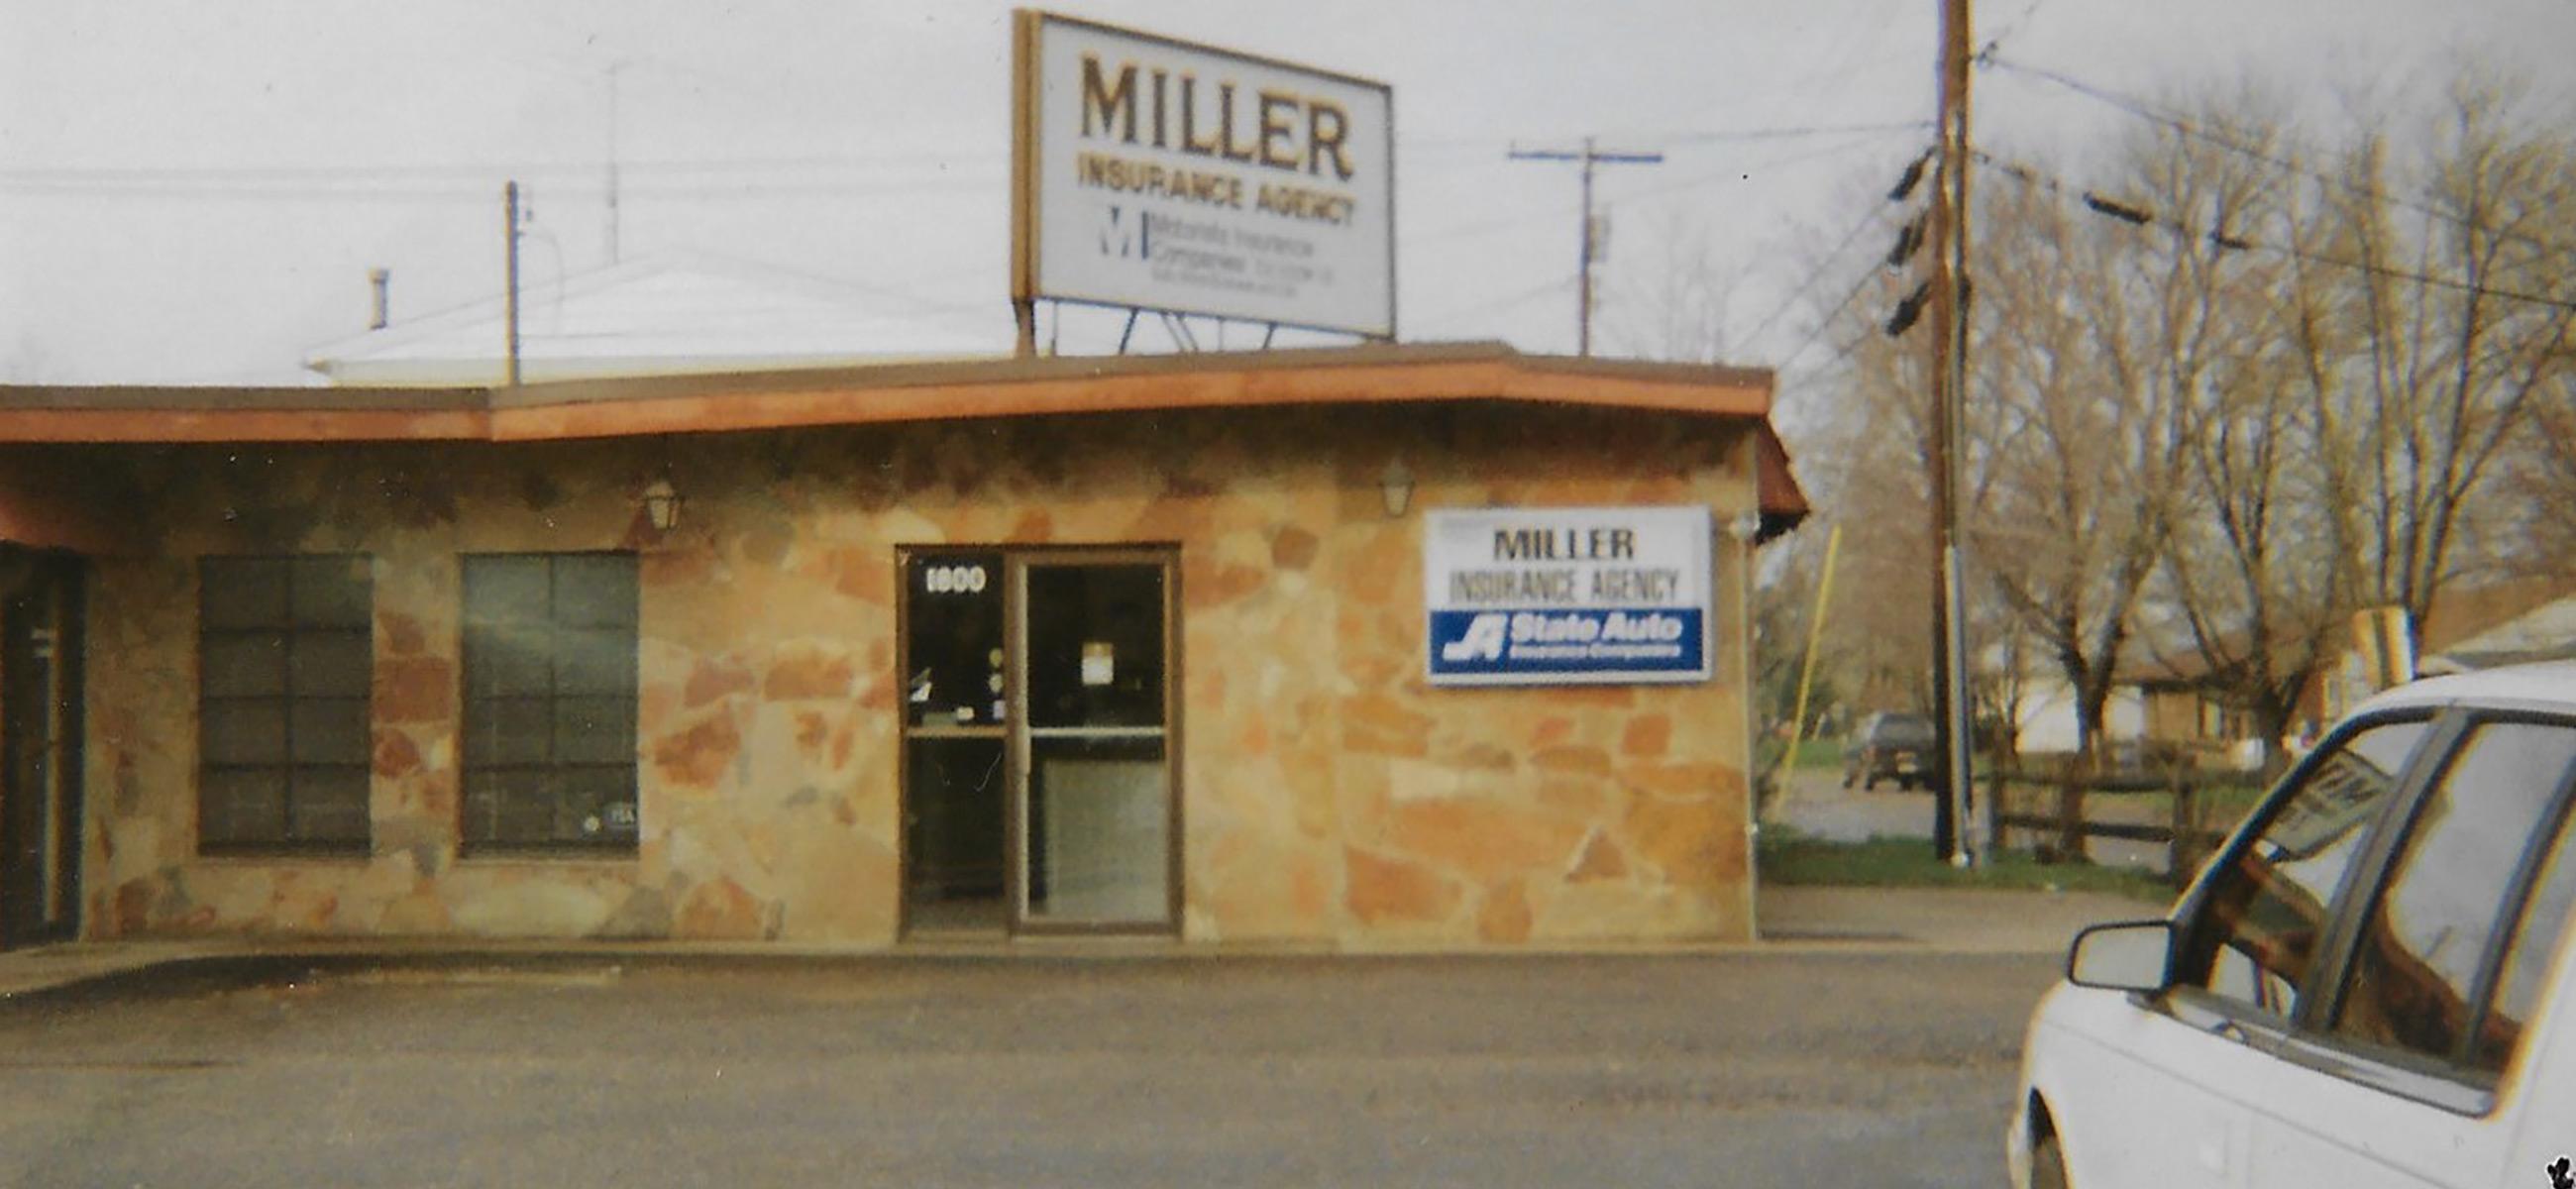 Genie.com initiates an online dating service